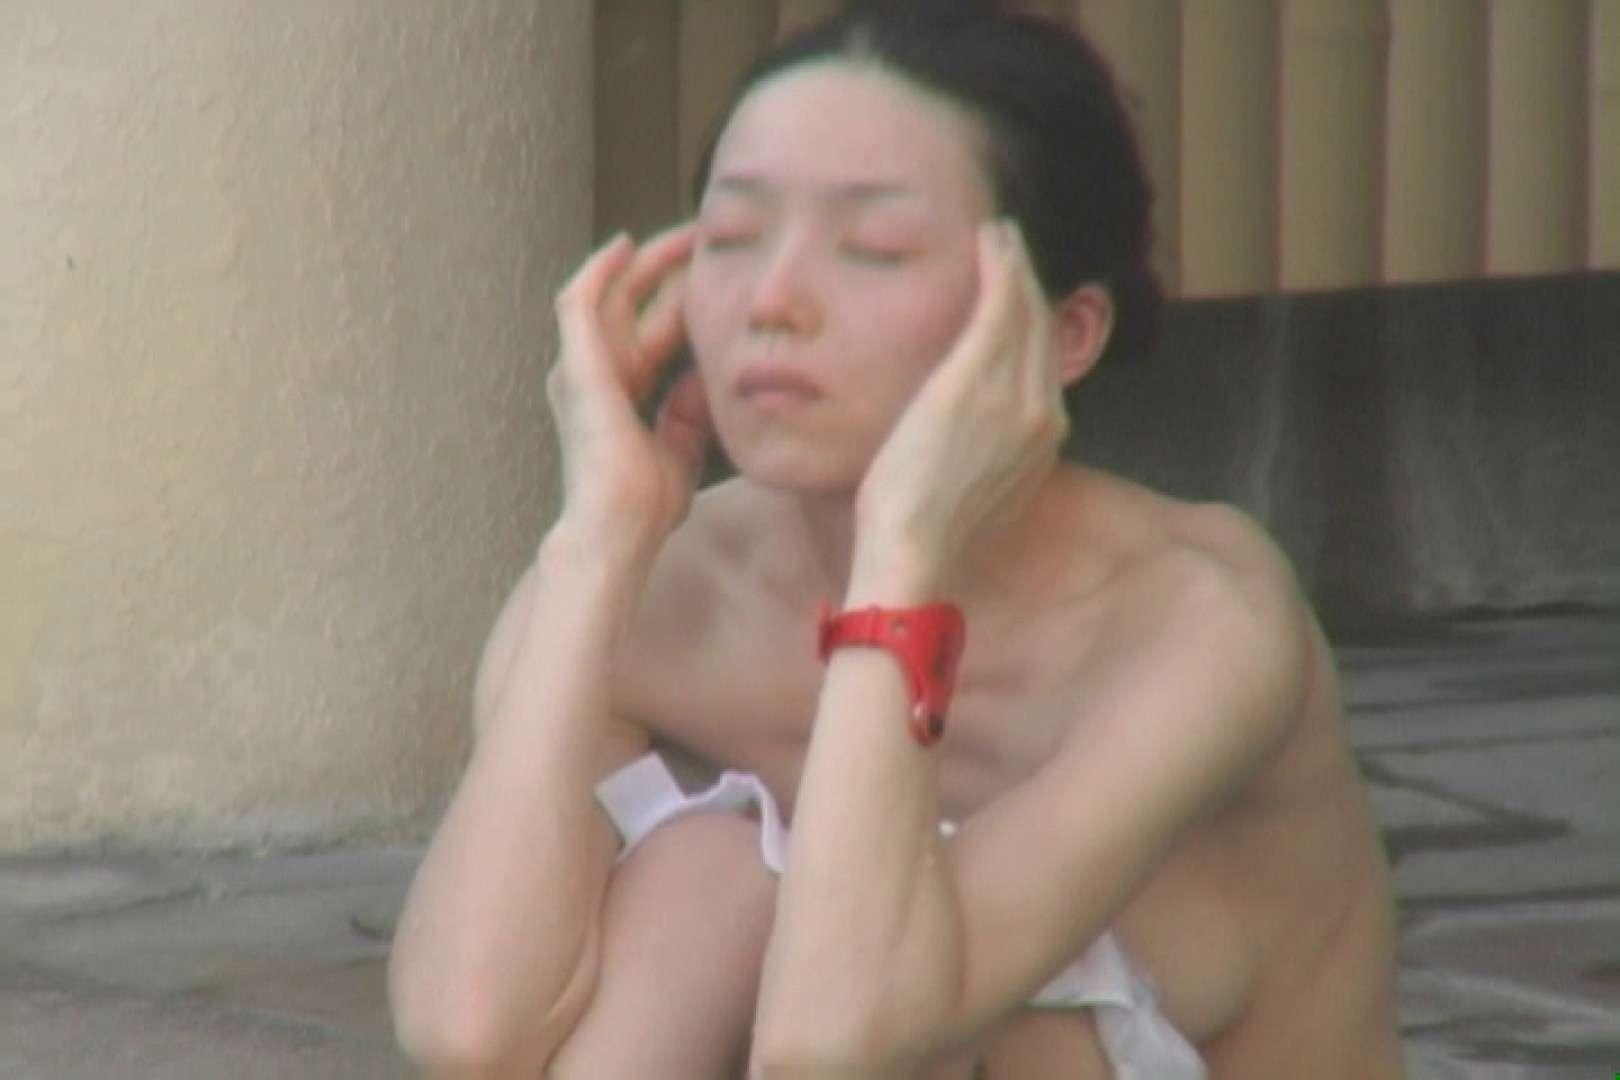 Aquaな露天風呂Vol.577 露天風呂突入   盗撮師作品  101pic 37